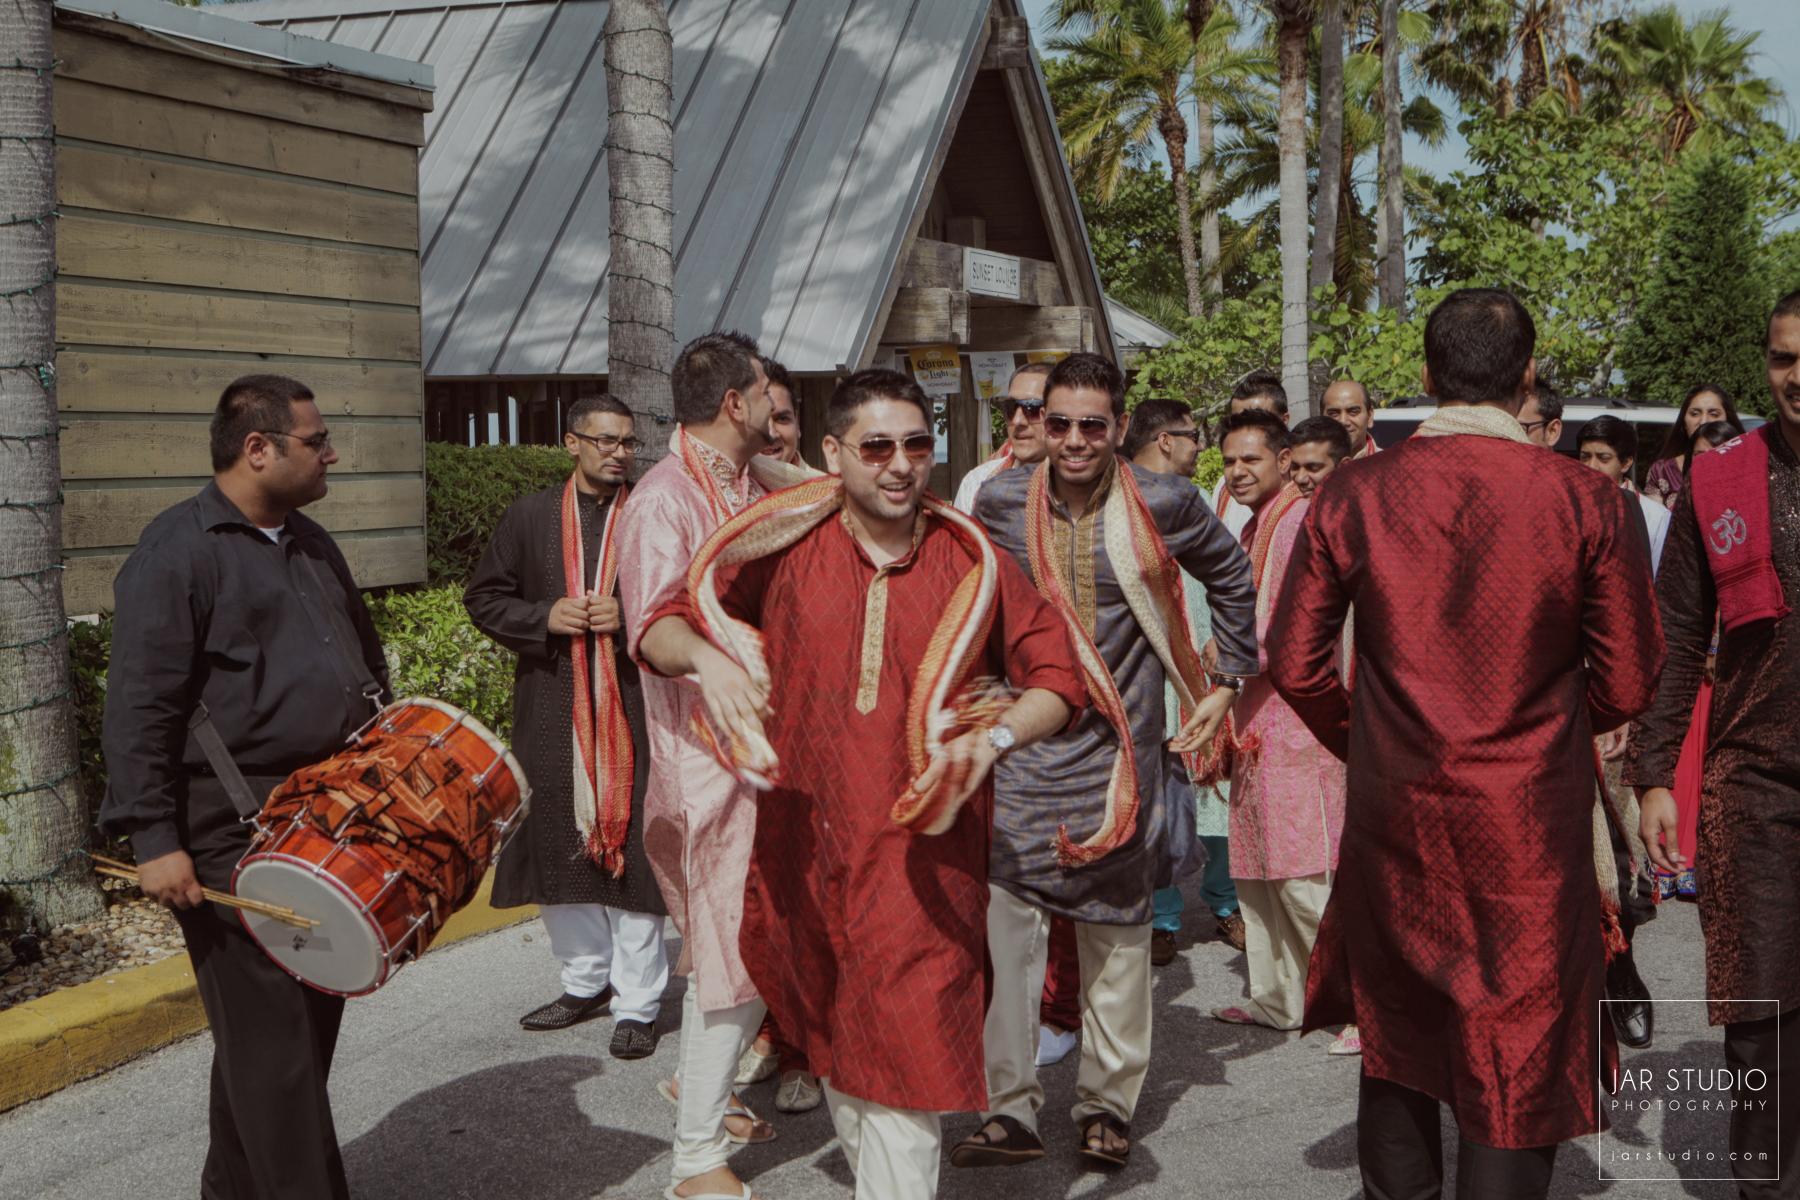 26-indian-wedding-jarstudio-photography-tampa-fl.JPG